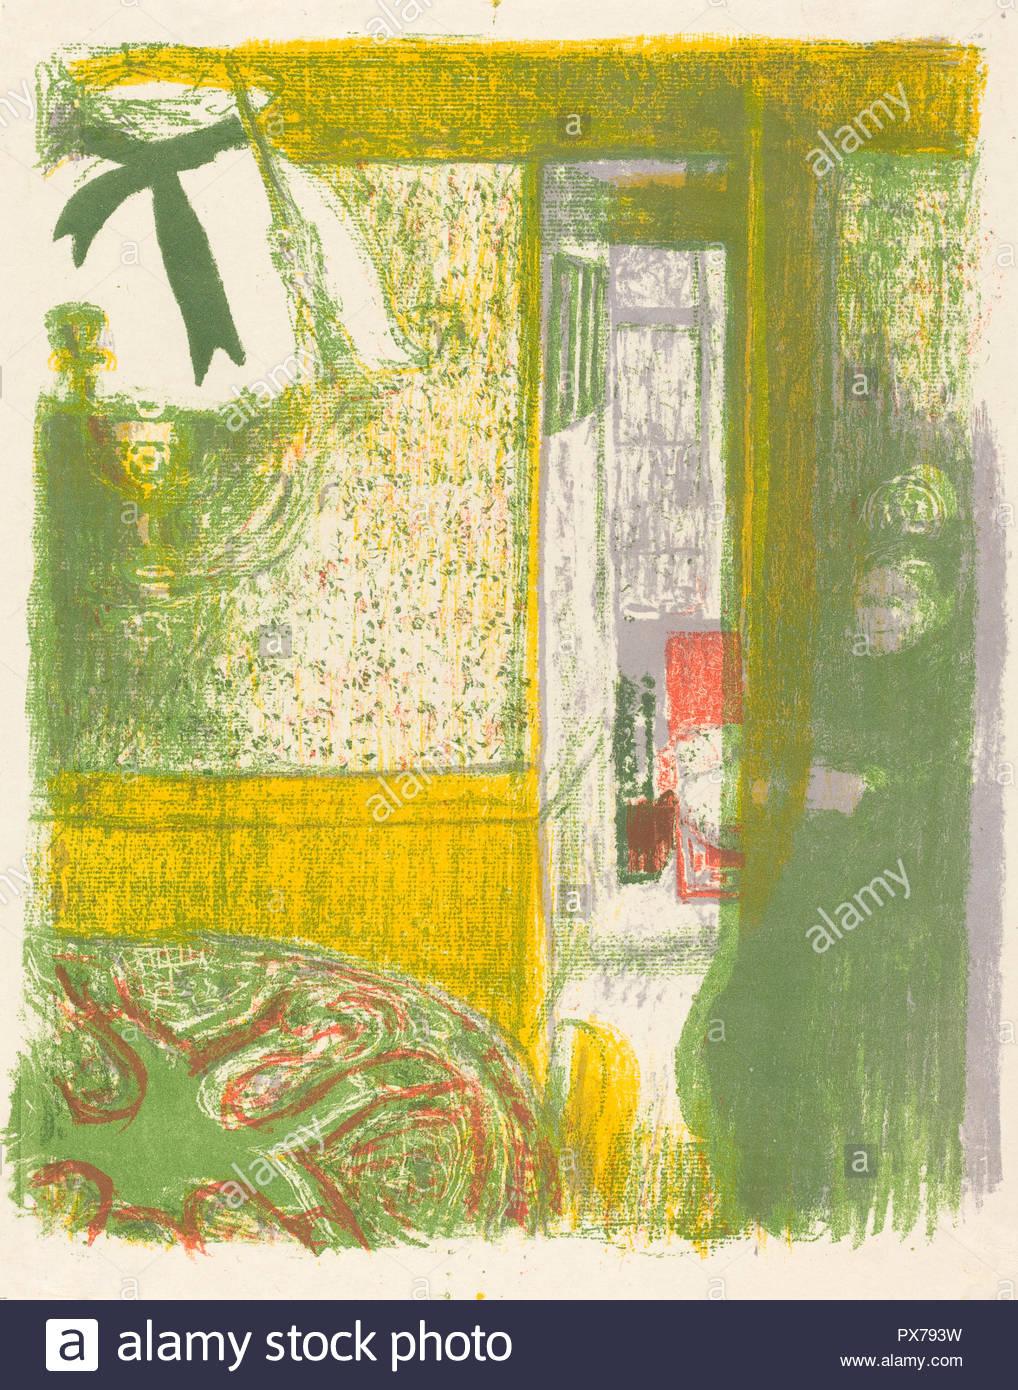 Interieur mit hängenden Lampe (Interieur a la Suspension). Stand: 1899. Medium: farblithographie auf China Papier. Museum: Nationalgalerie, Washington DC. Autor: Edouard Vuillard. Stockbild